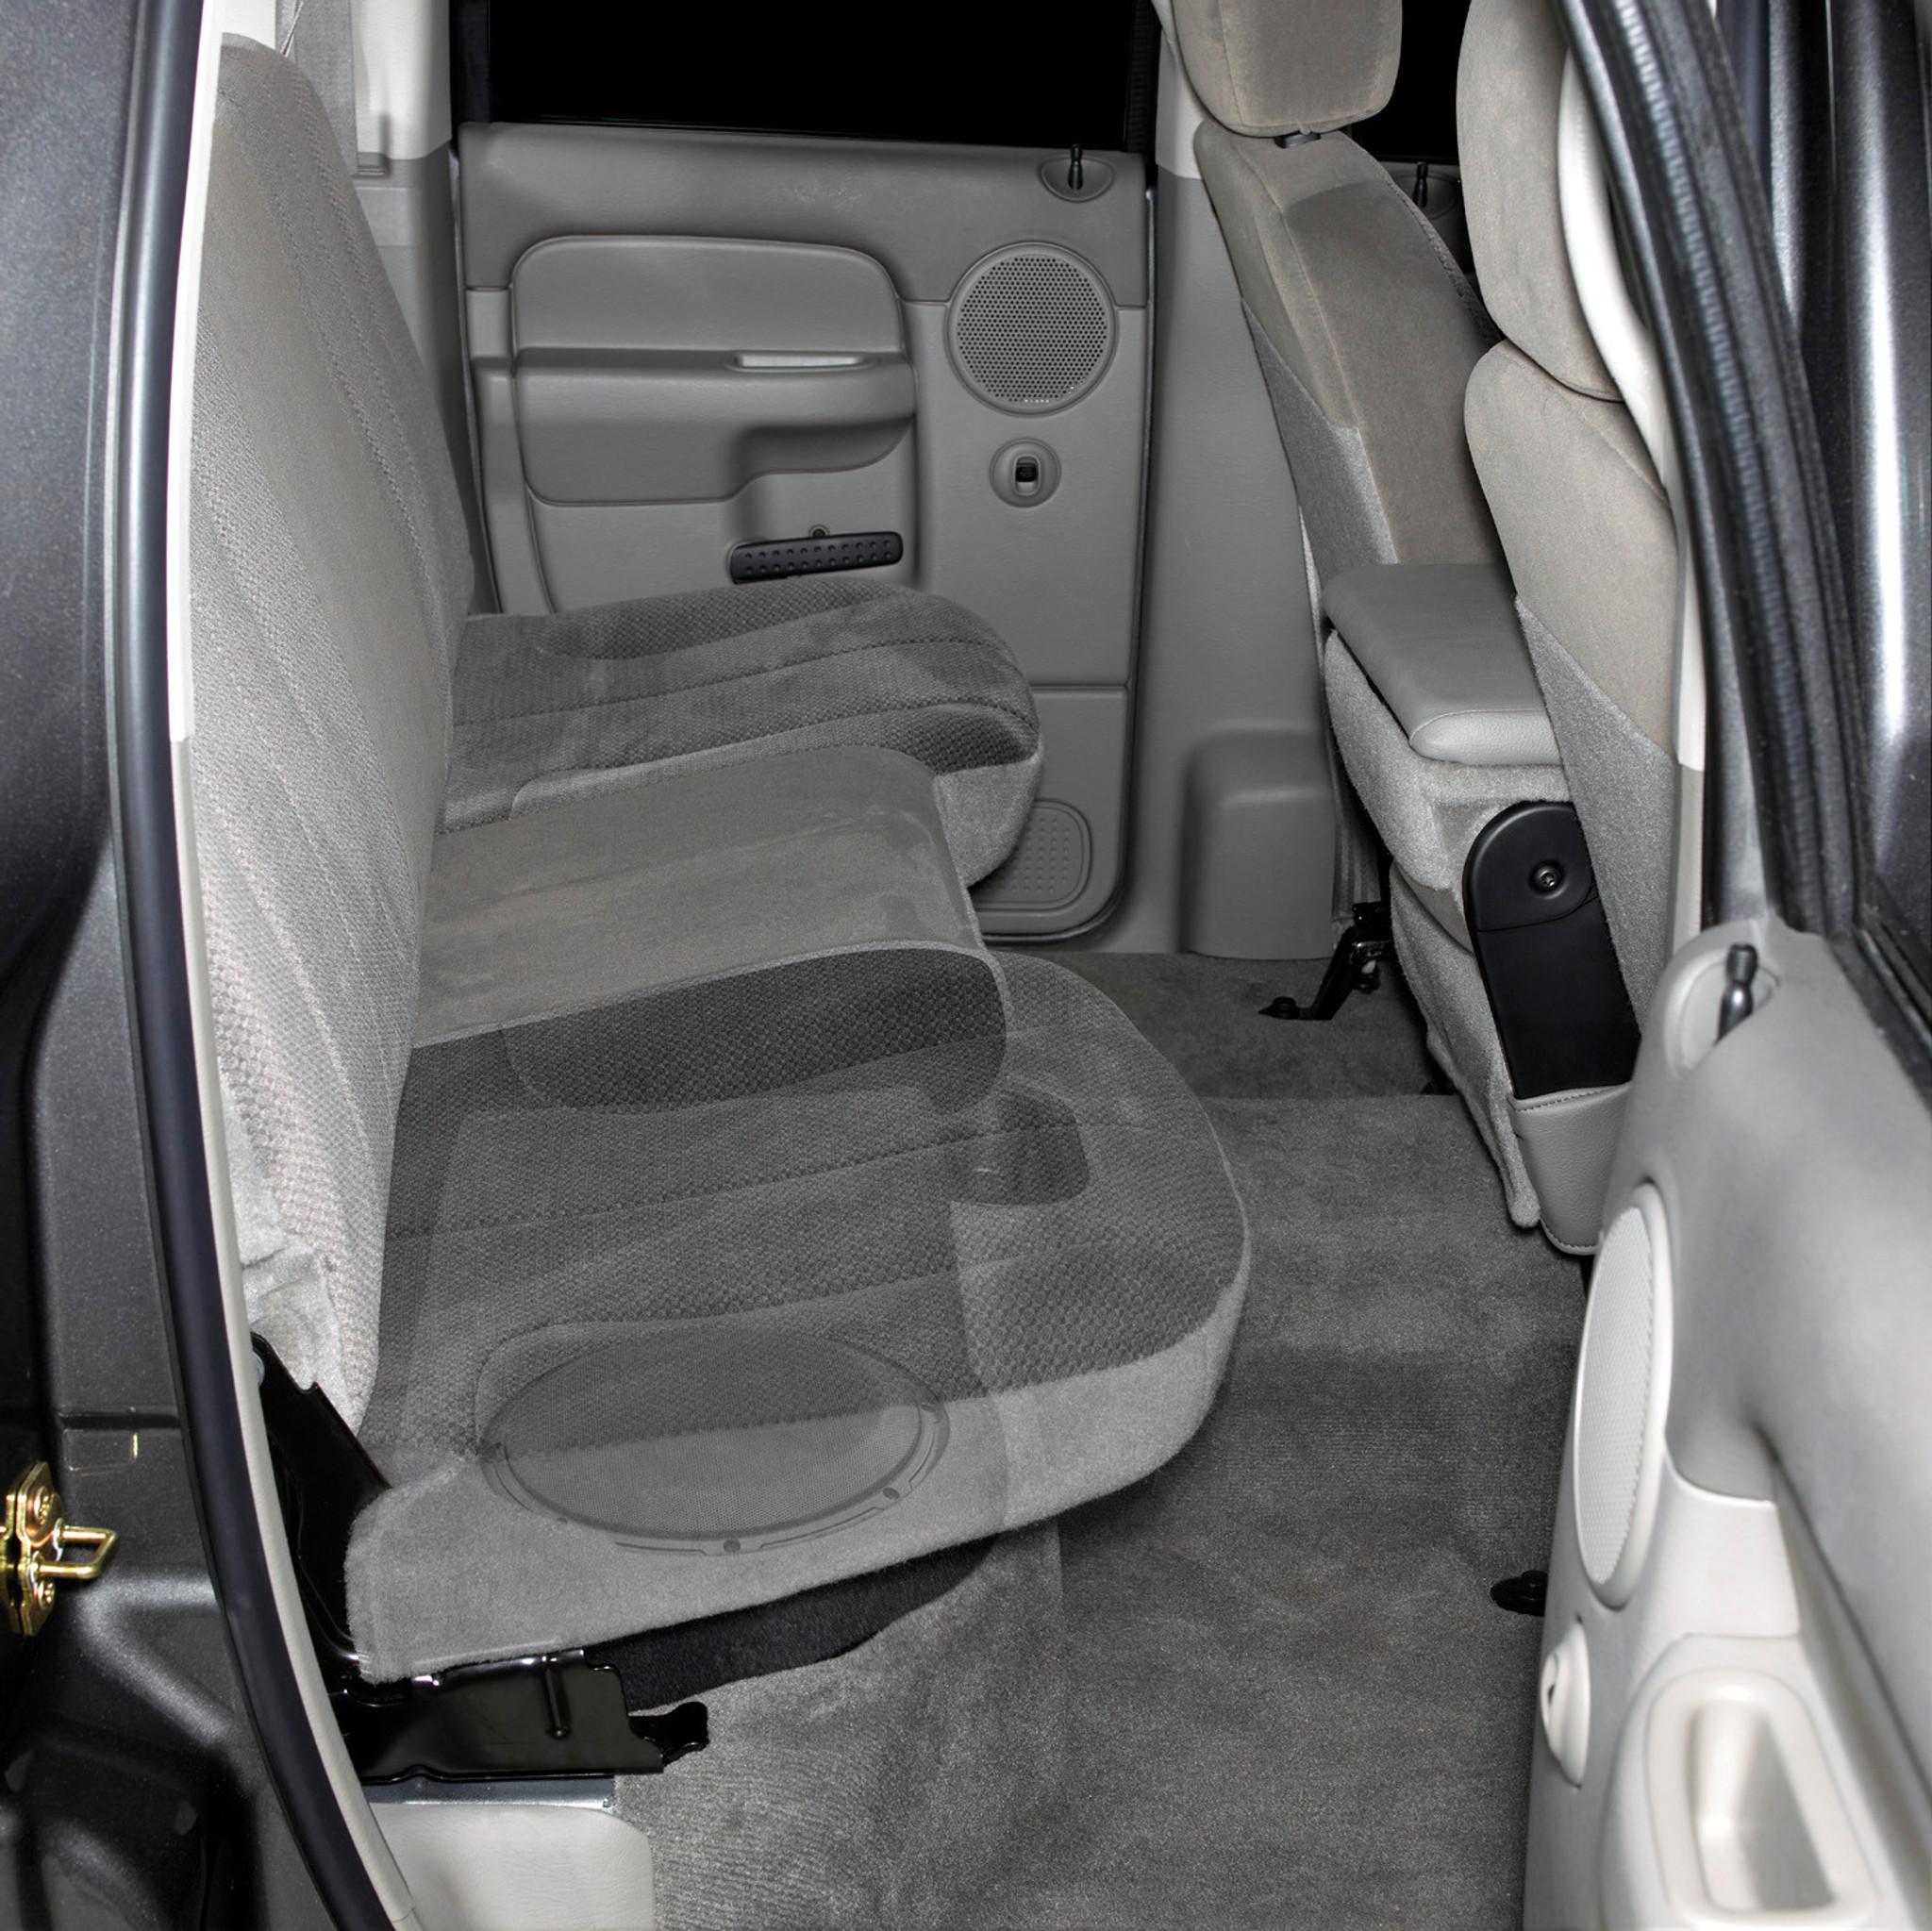 Star Armor Kit 2002 2009 Ram Quad Cab: JL Audio SB-D-QDRAM/10W3v3: Stealthbox® For 2002-Up Dodge